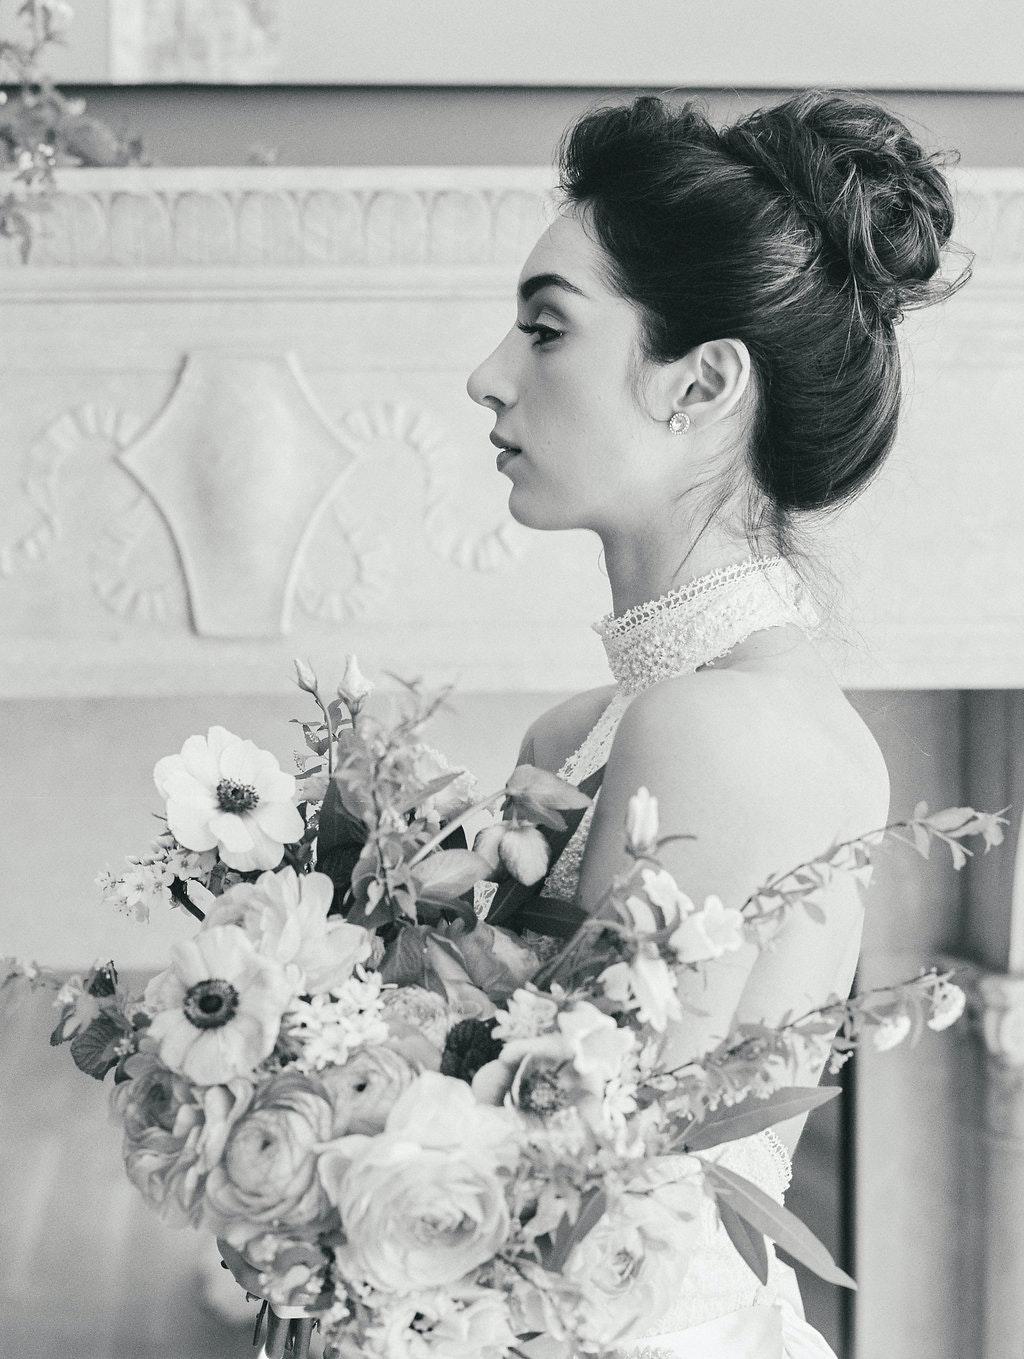 Gabriela Cortes's Model portfolio